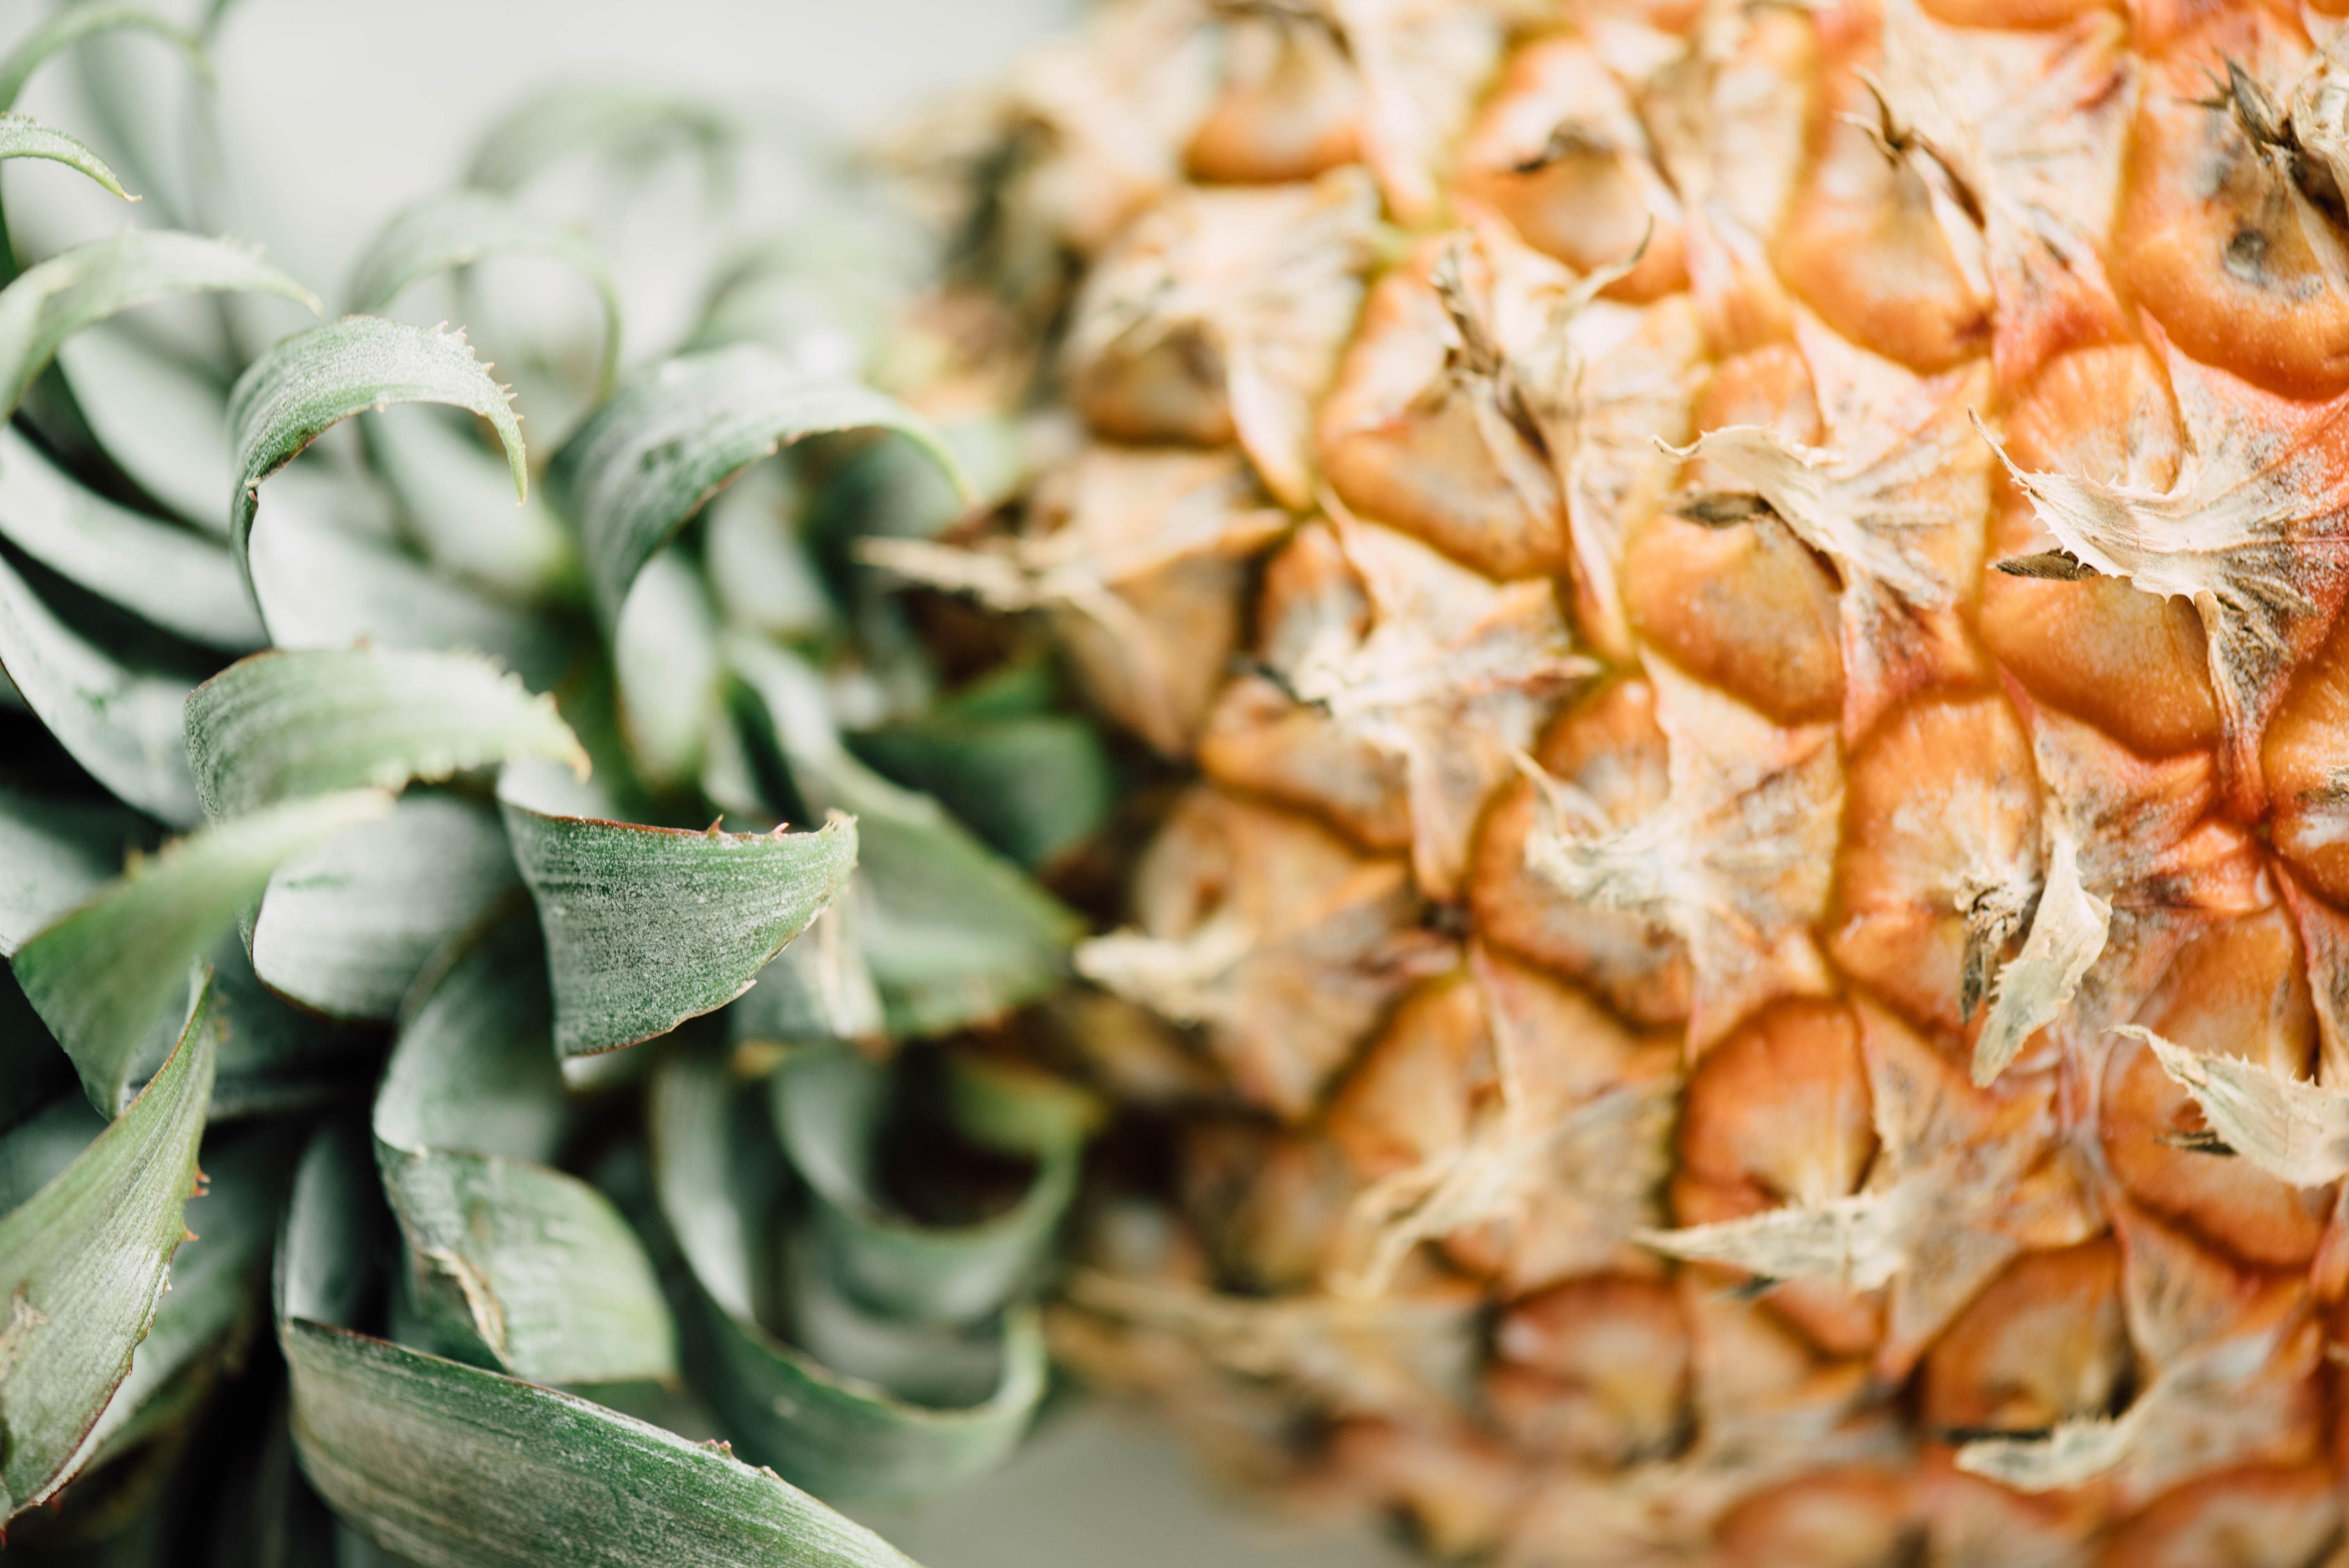 closeup photo of pineapple